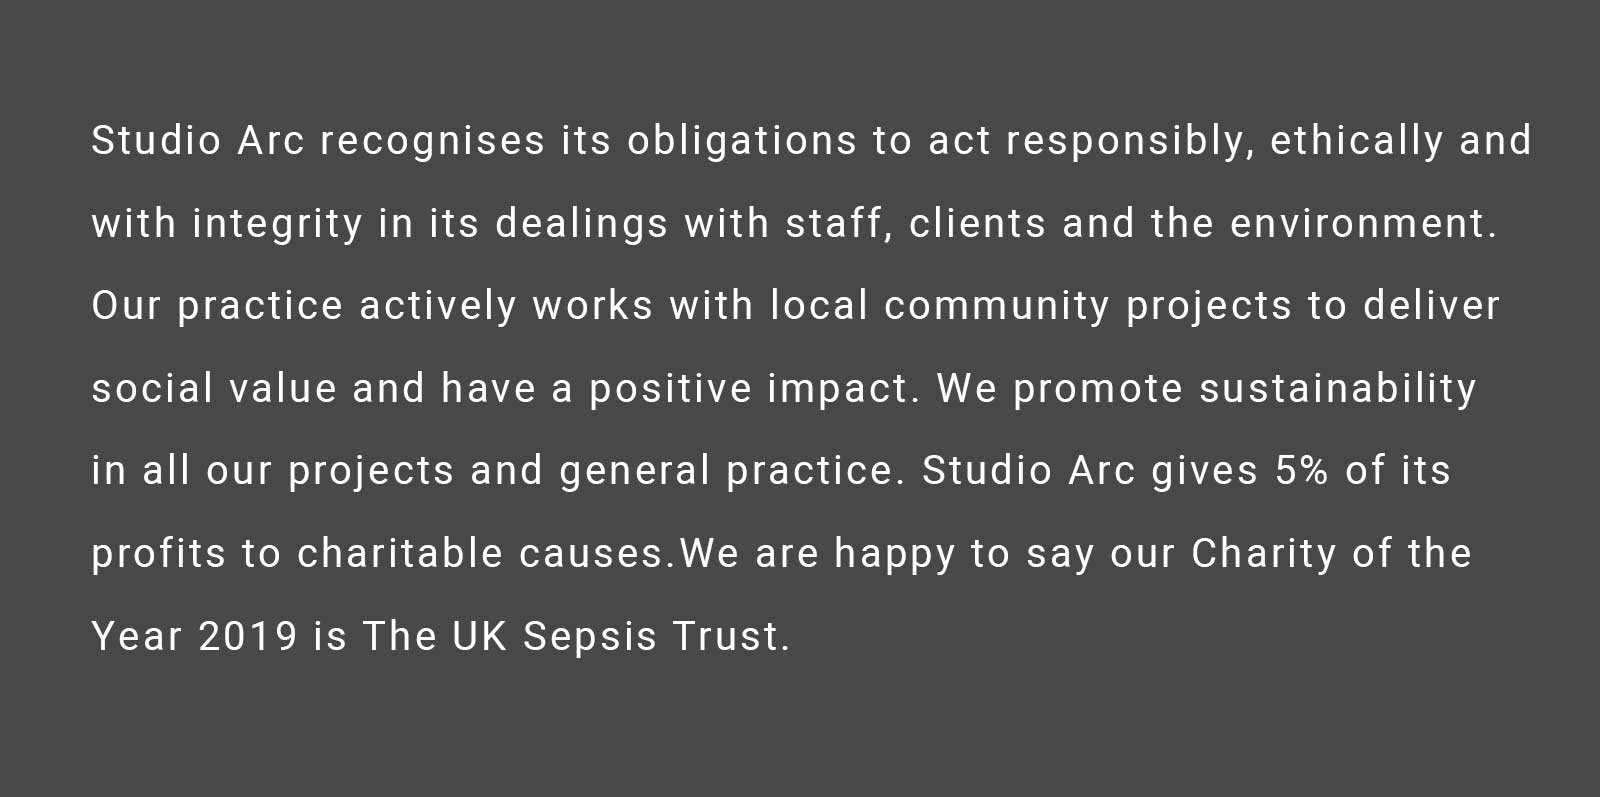 Studio Arc image on charity donations